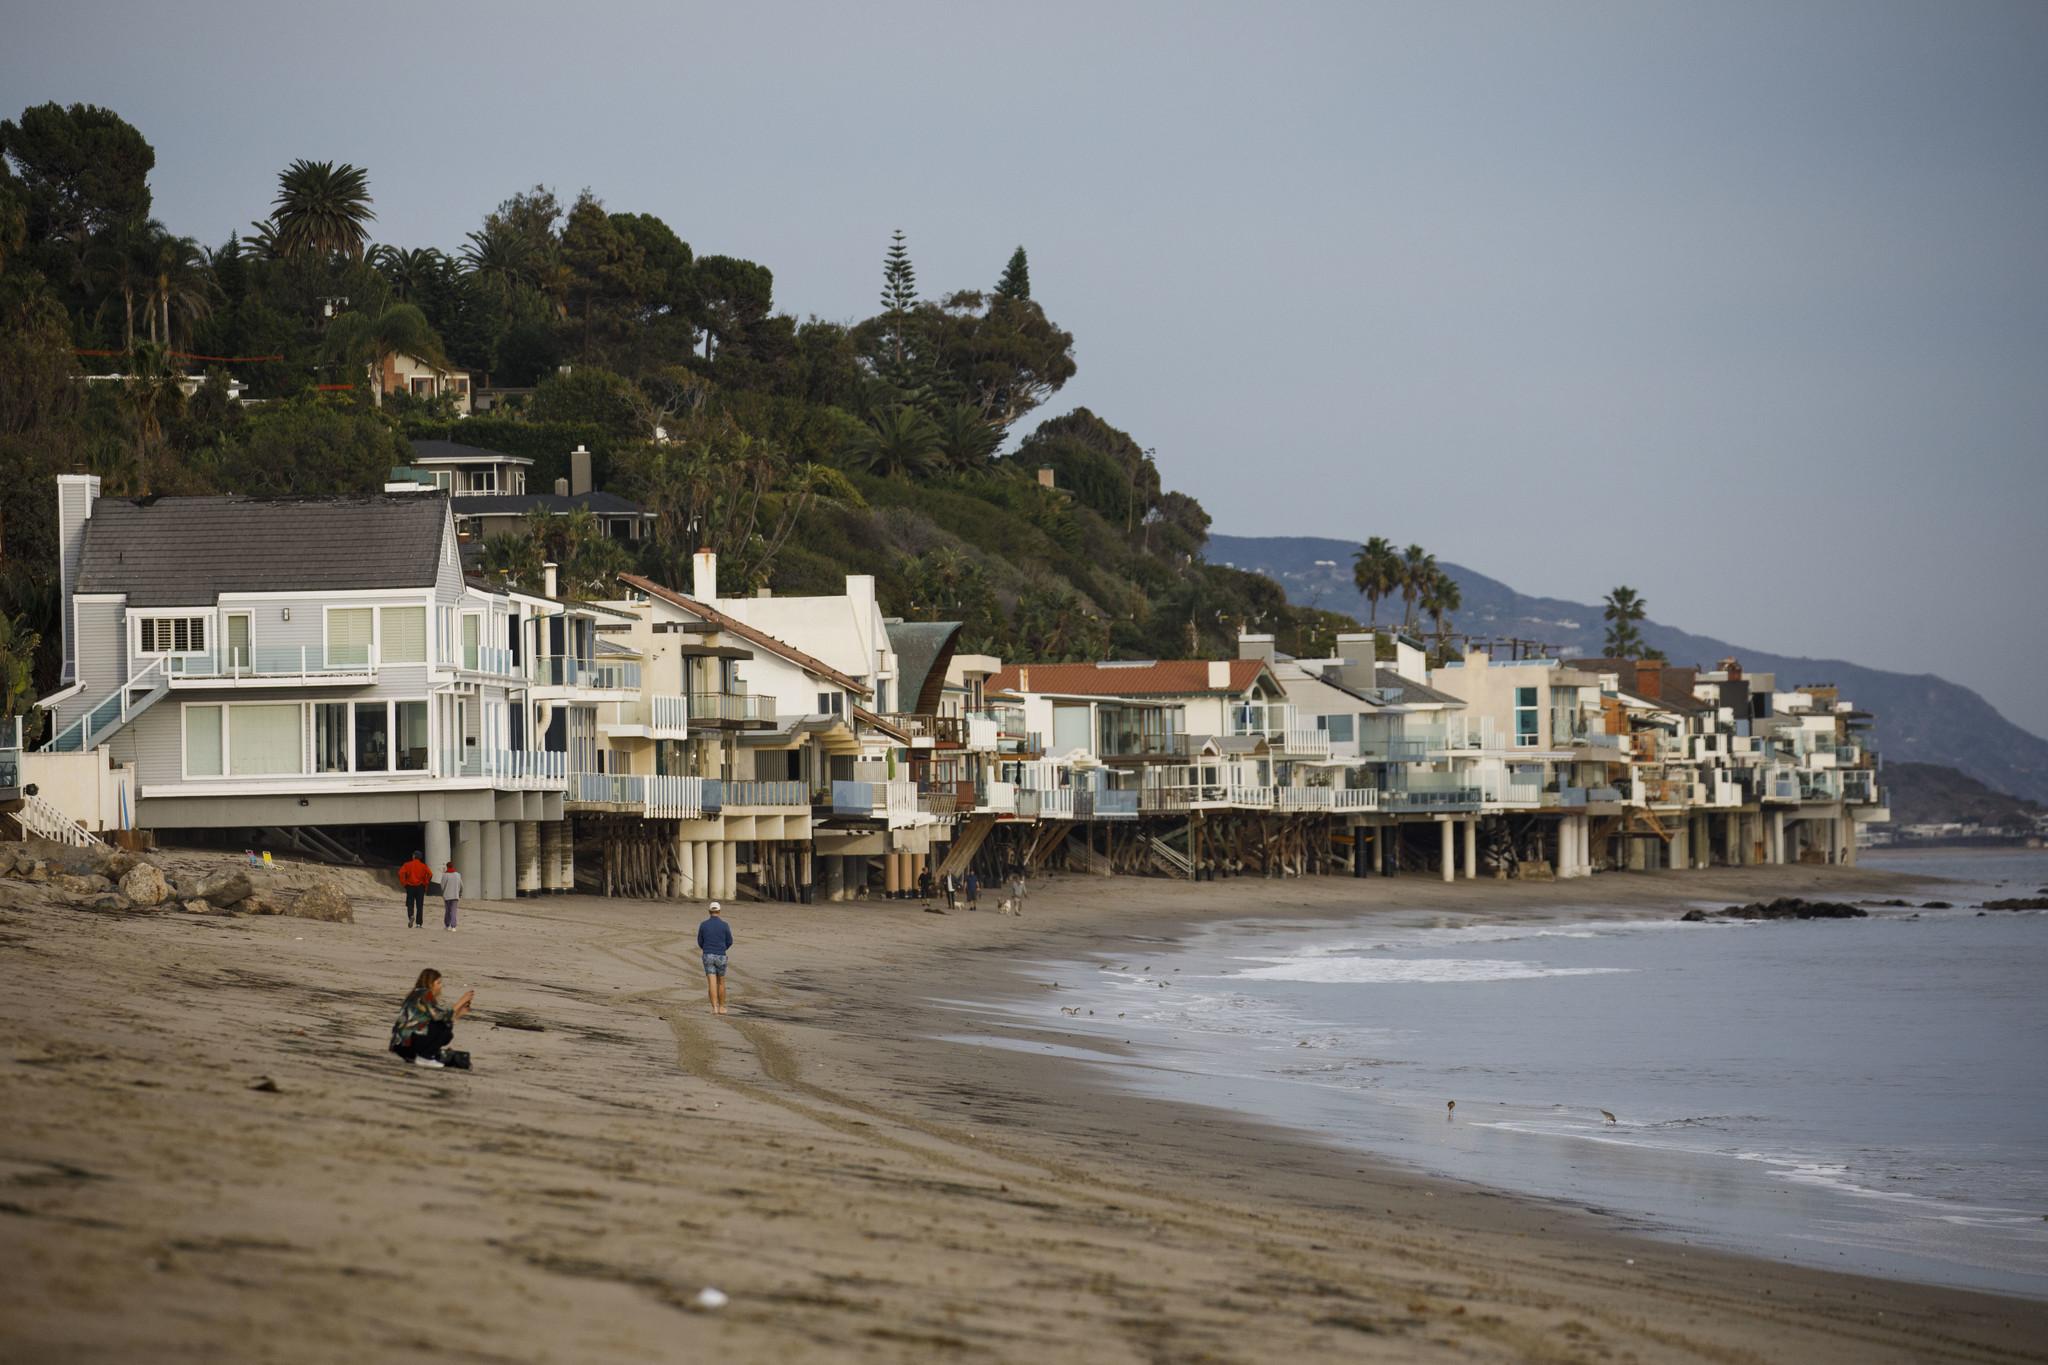 Escondido Beach in Malibu